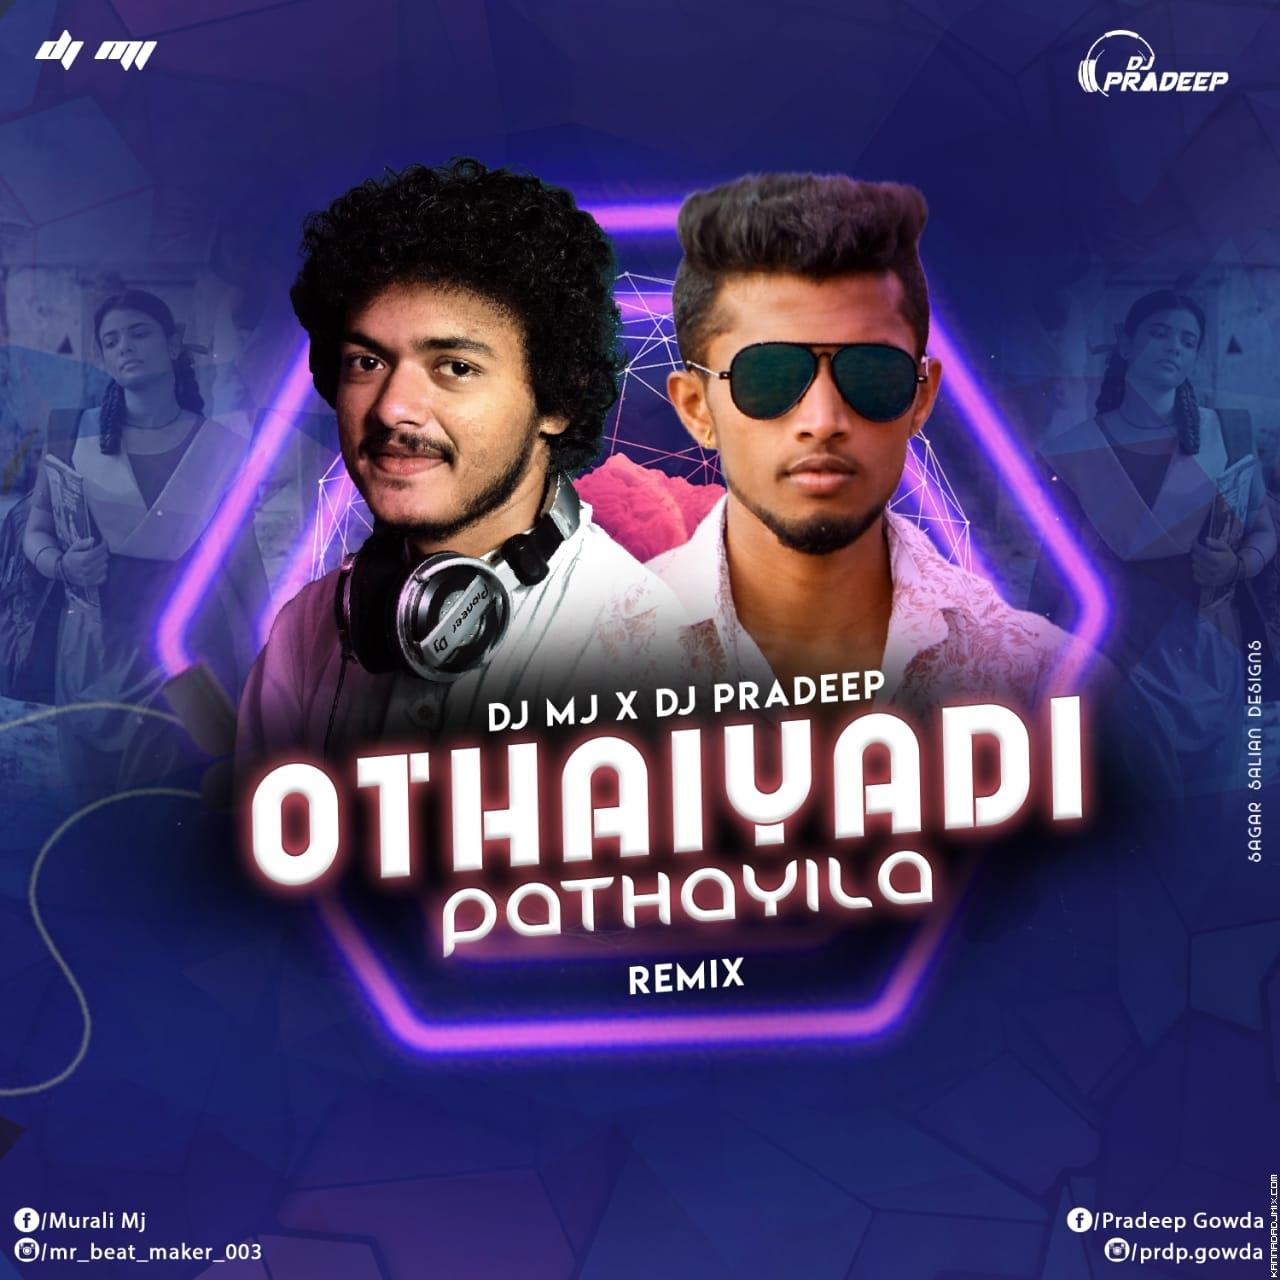 OTHAIYADI PATHAYILA remix DJ MJ  DJ PRADEEP.mp3